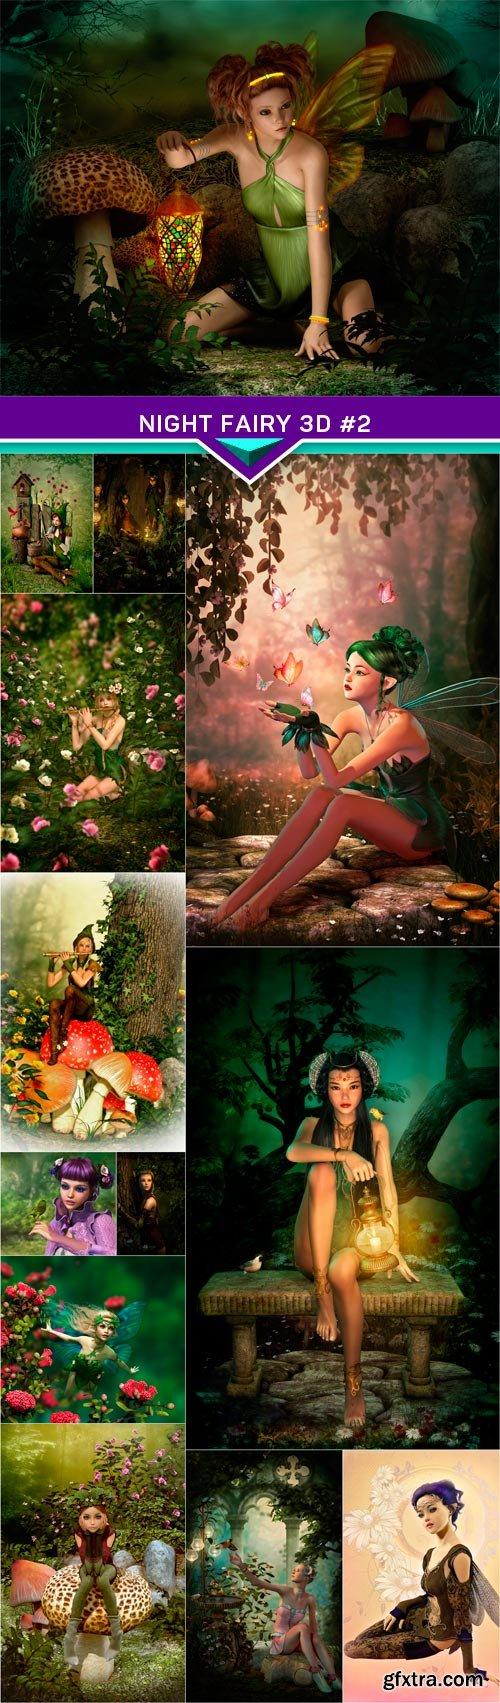 Night Fairy 3d #2 13X JPEG